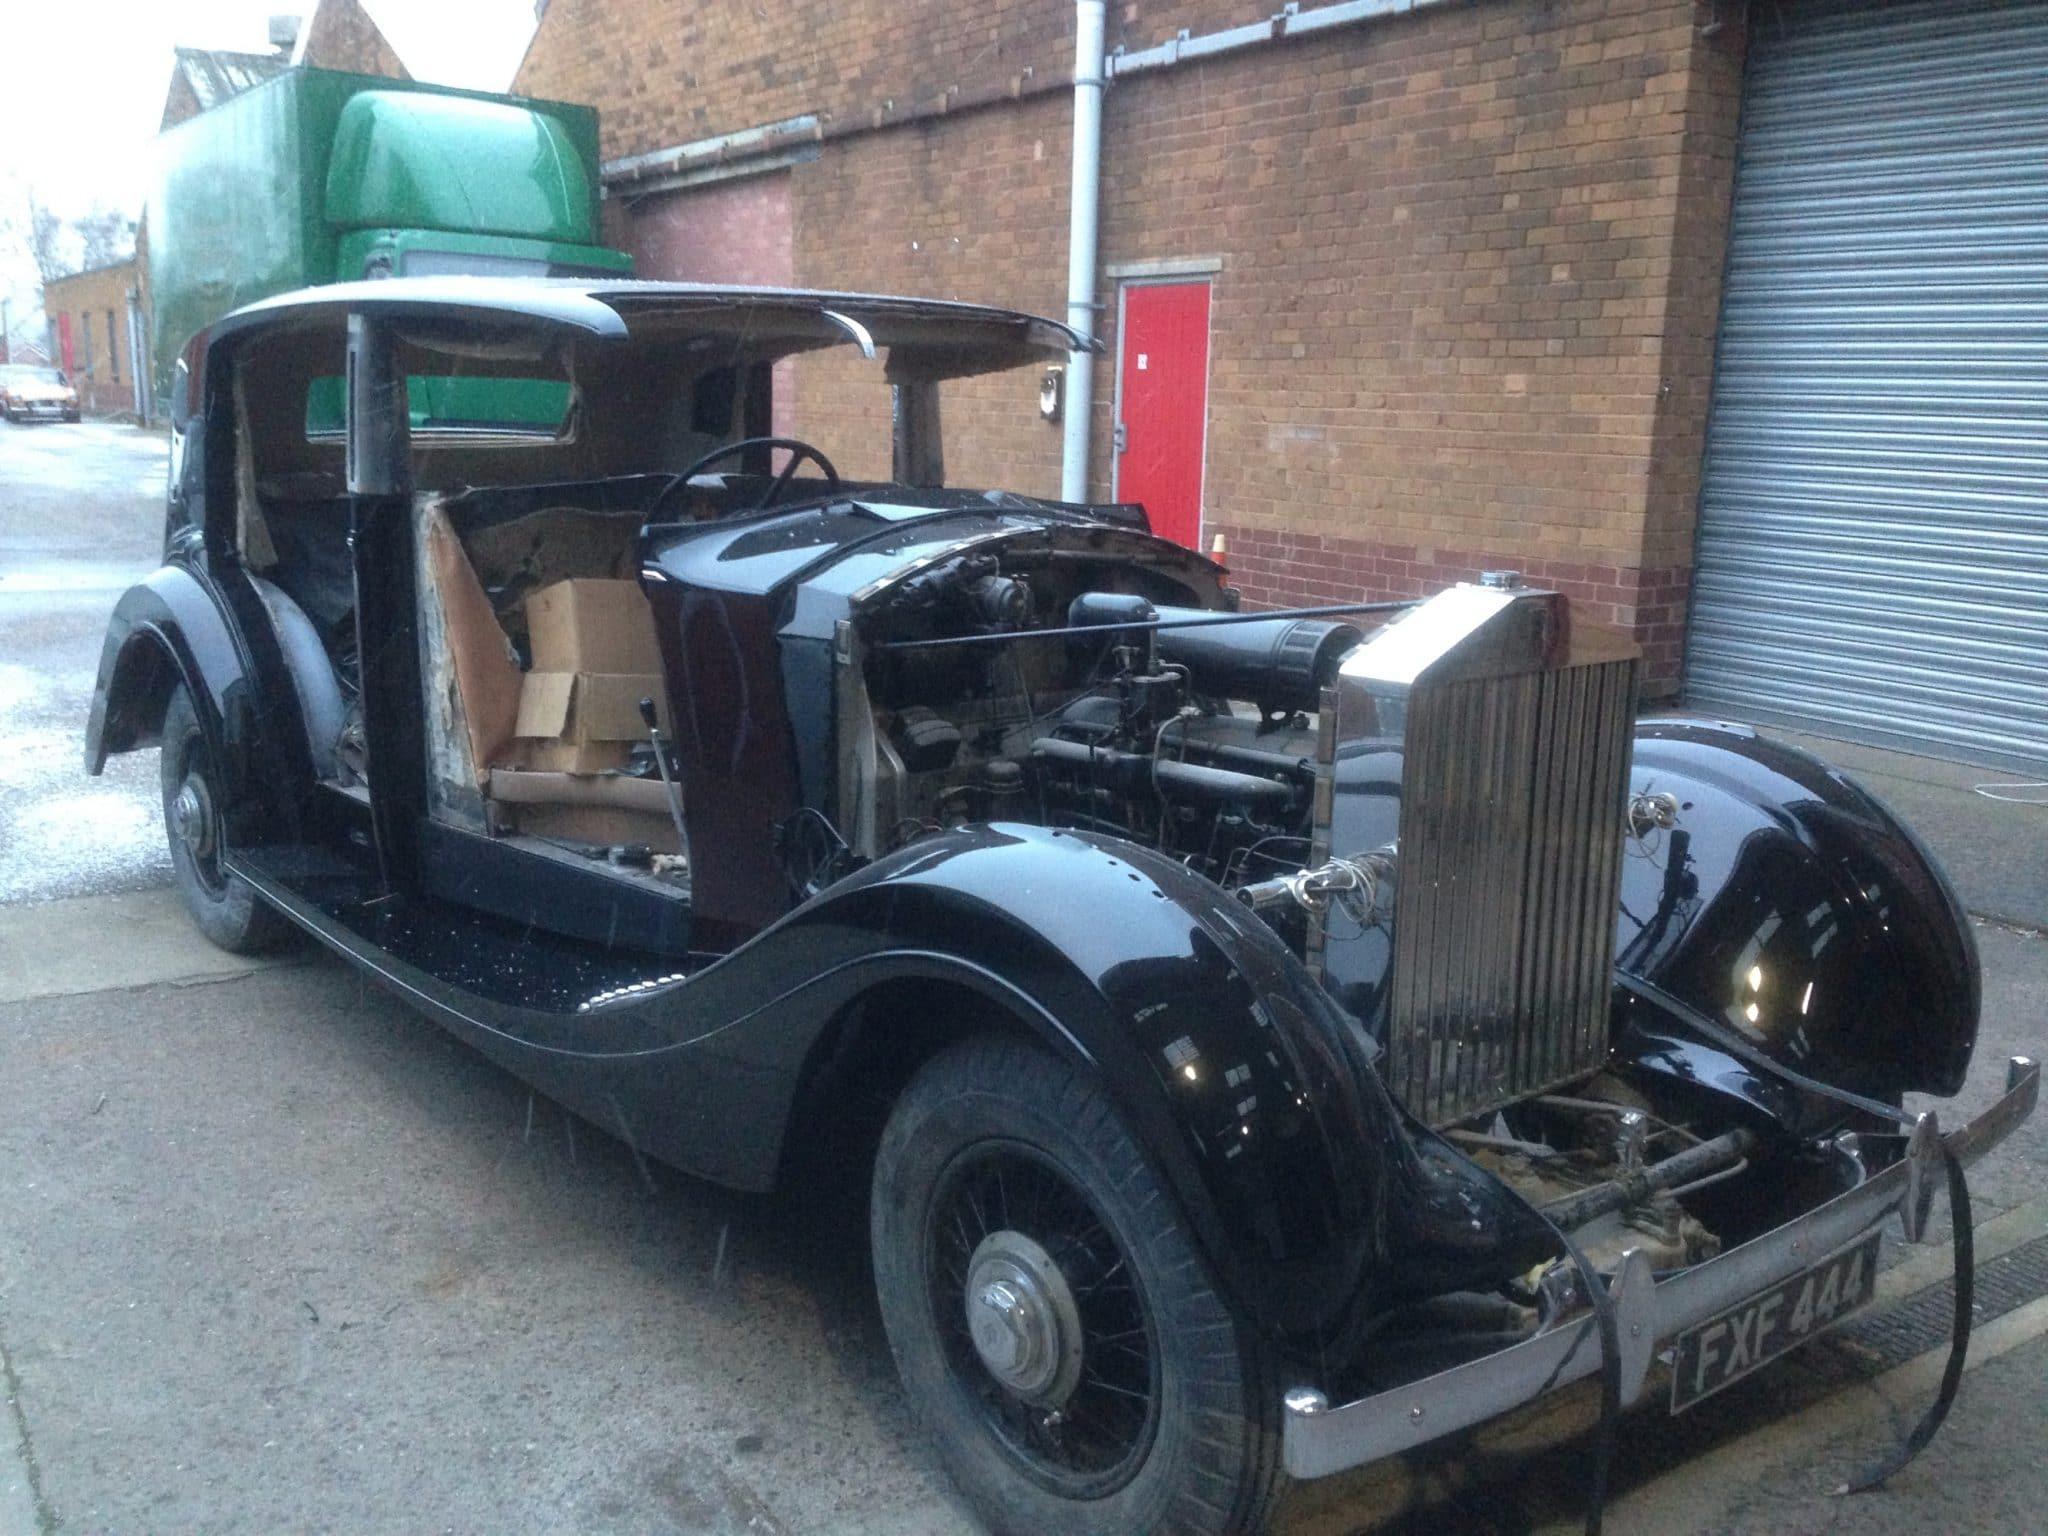 Black Rolls Royce restoration